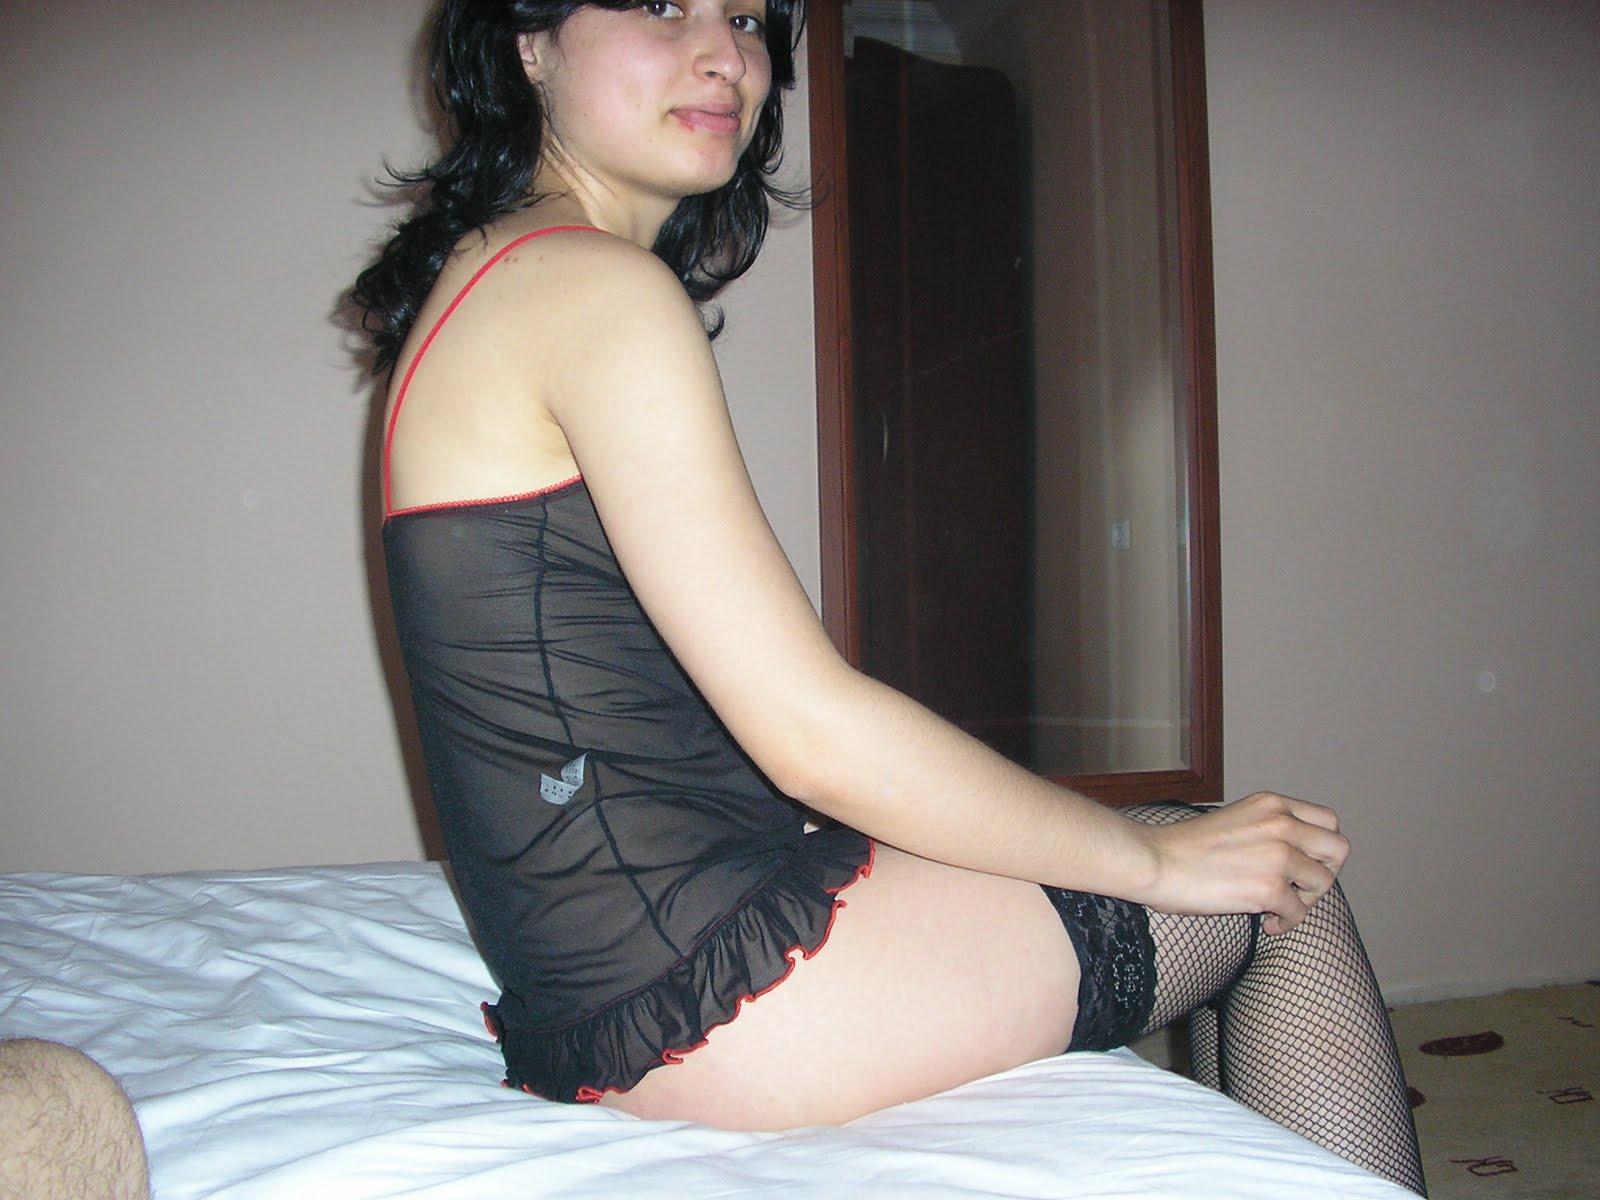 She Www turkisch porno com